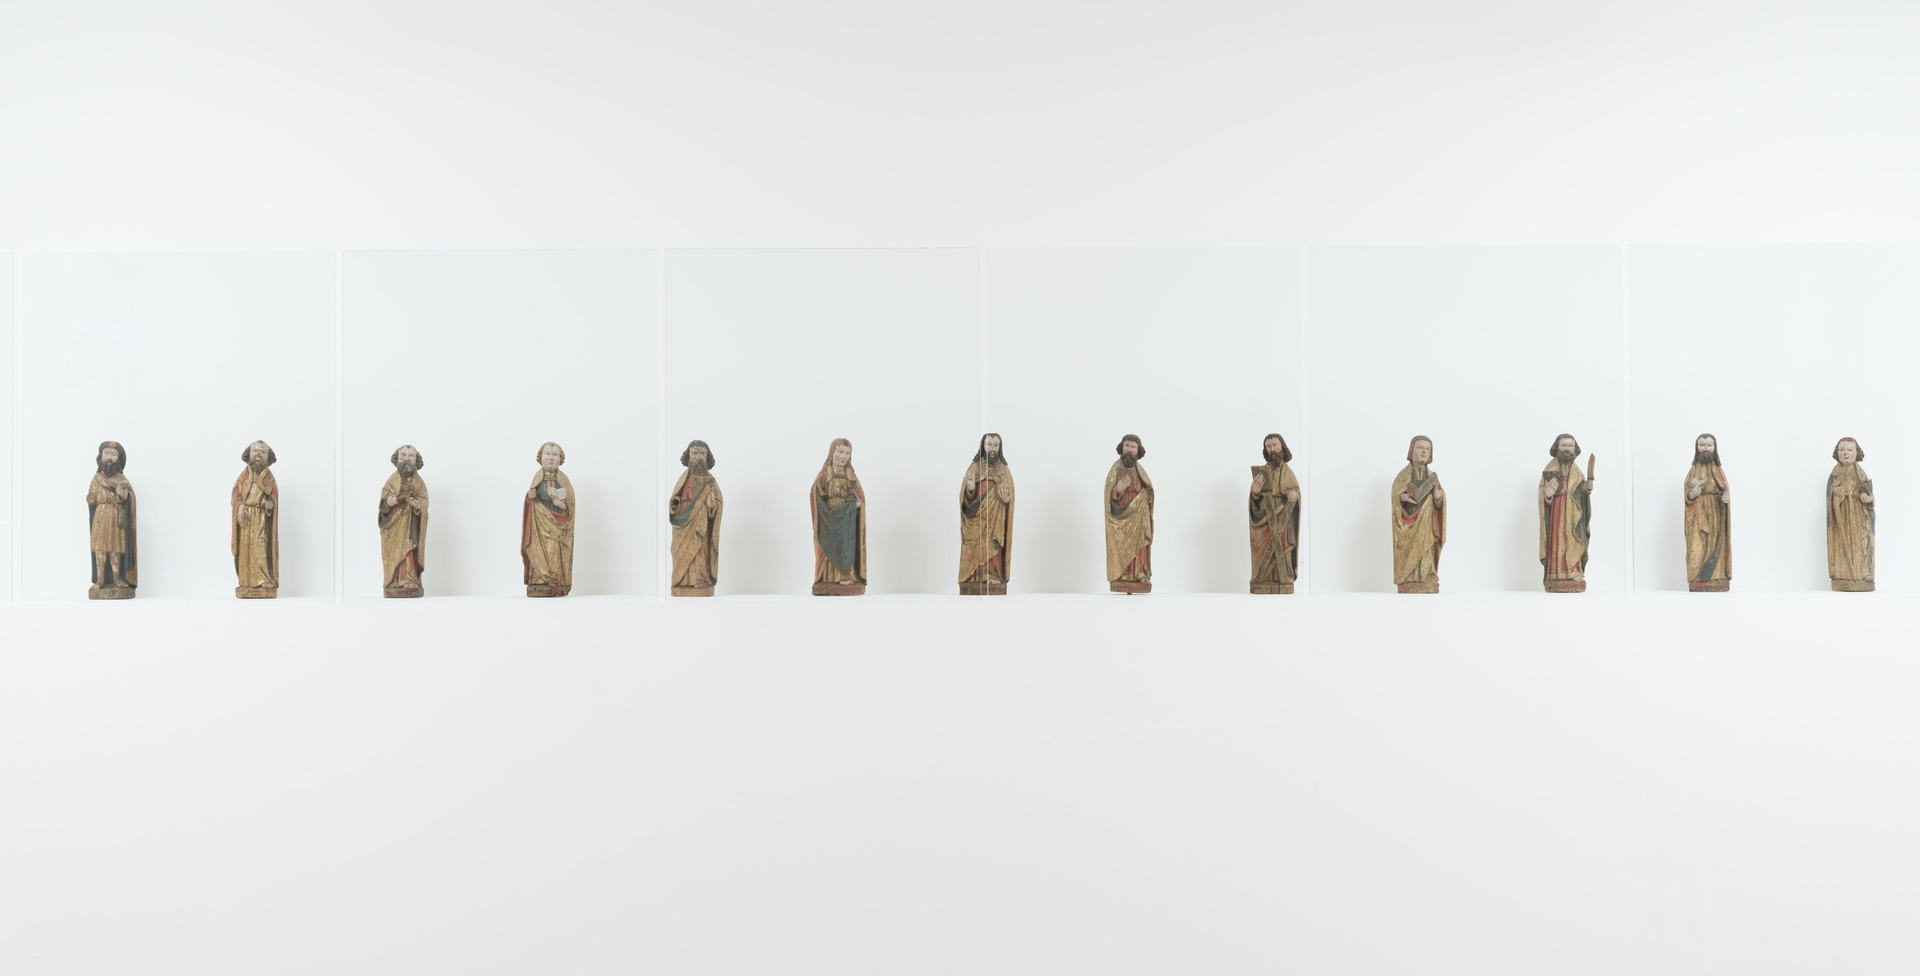 Christus en de twaalf apostelen